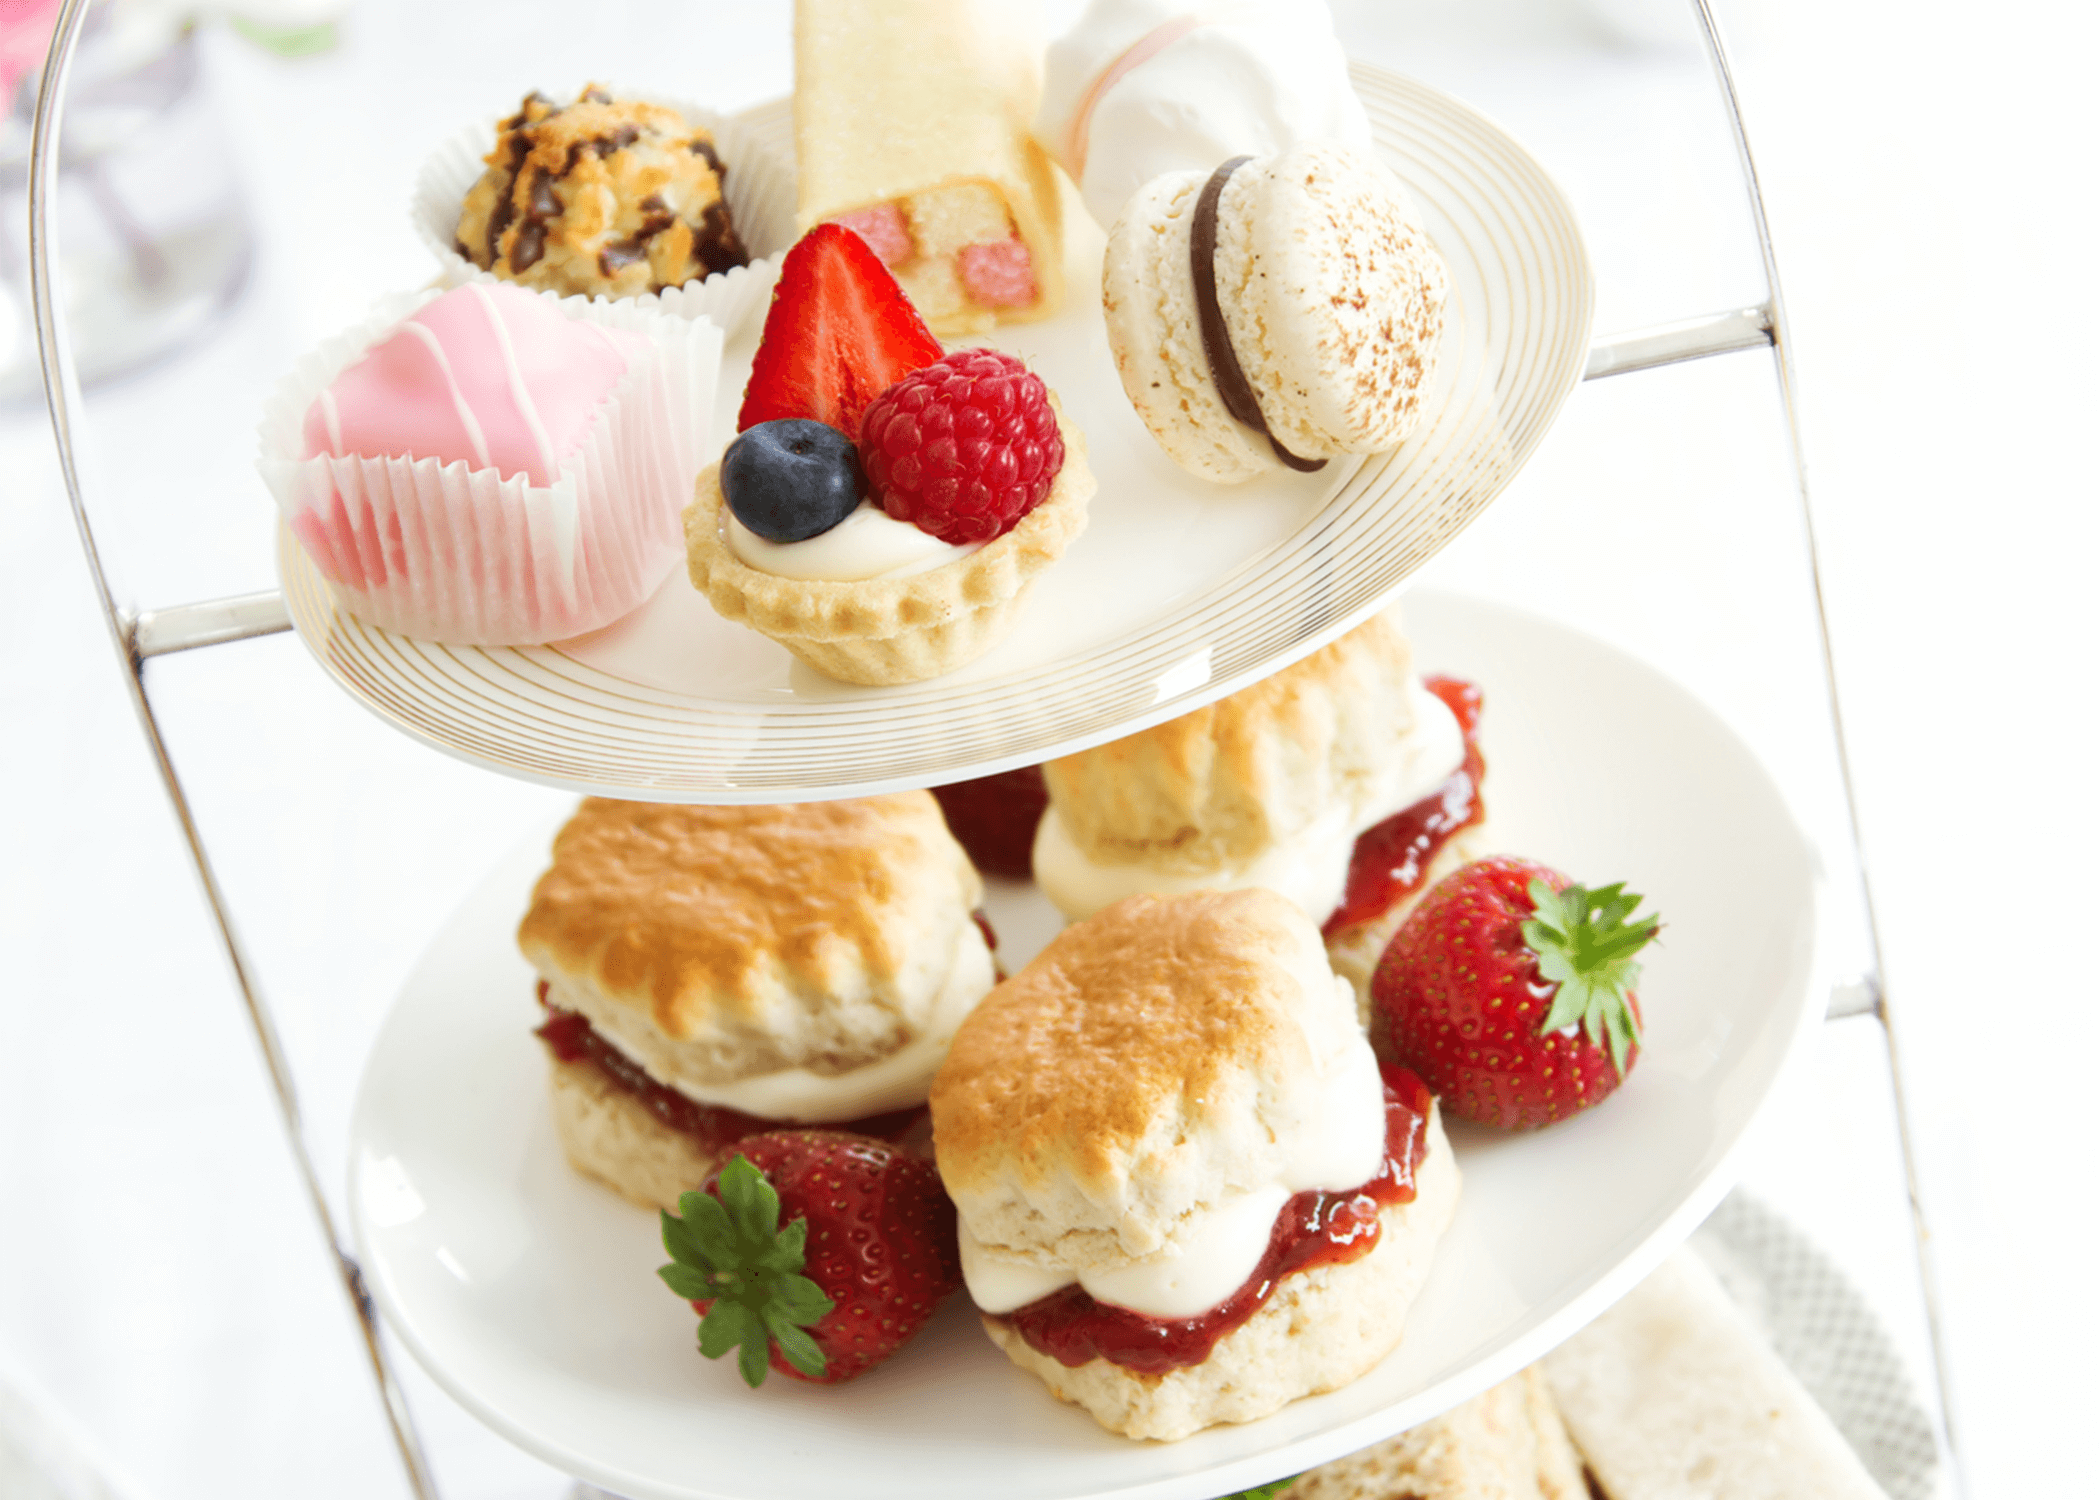 15 Tiny Bites for the Perfect Tea Party Food Menu